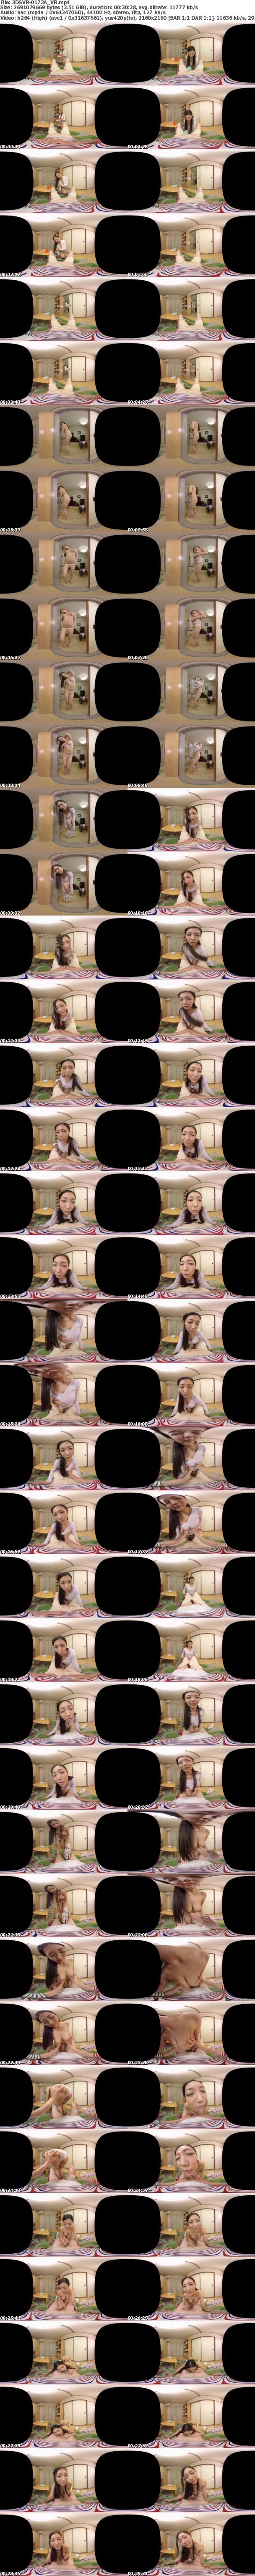 VR/3D 3DSVR-0173 【VR】おねシ●タVR 友達のお母さんを覗き見していたら、逆に迫られて筆下ろしされてしまったボク